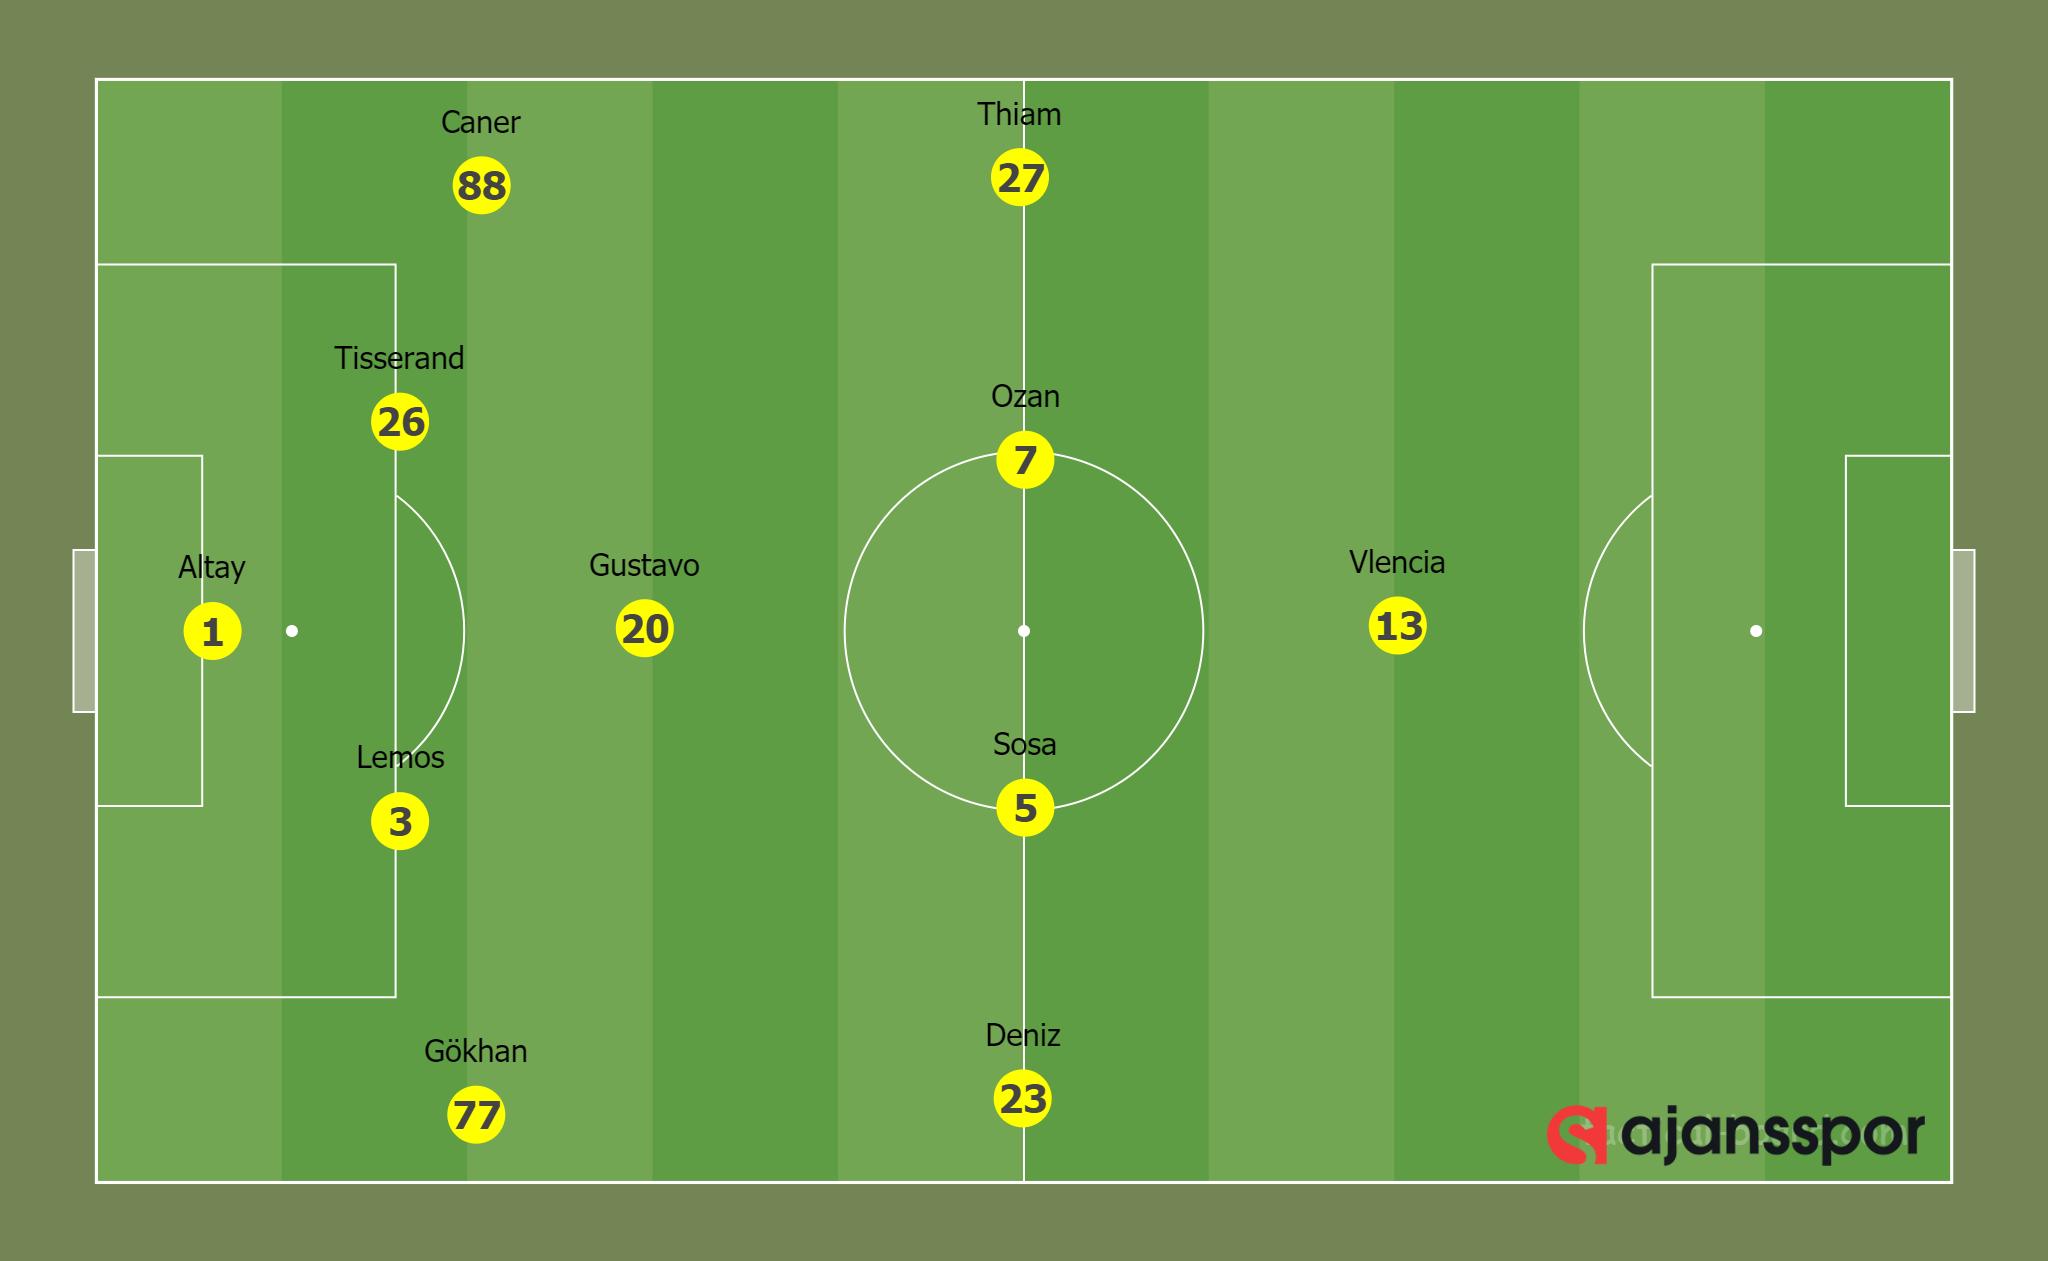 Galatasaray 0-0 Fenerbahçe (4-5-1)